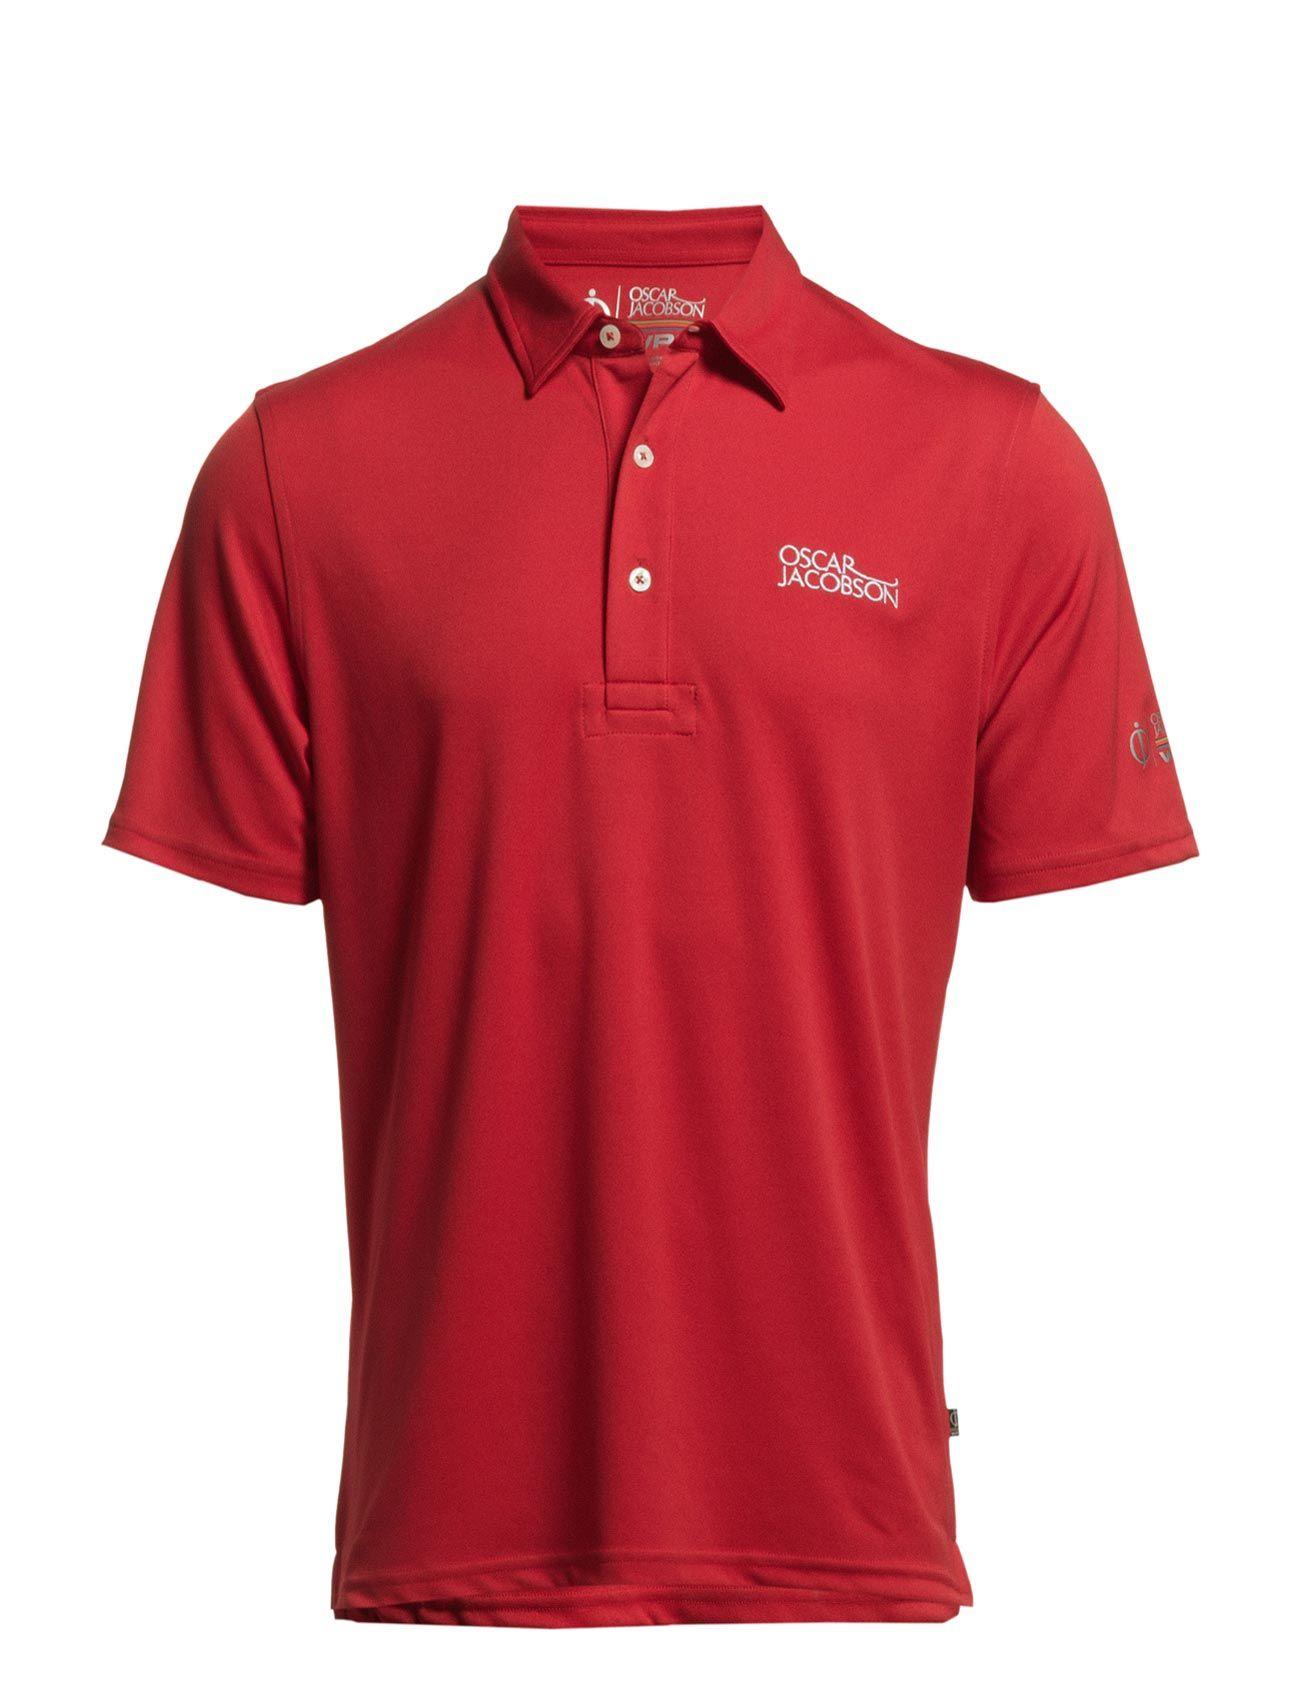 6166 Collin Tour Poloshirt Oscar Jacobson Golf Golf polo t-shirts til Herrer i